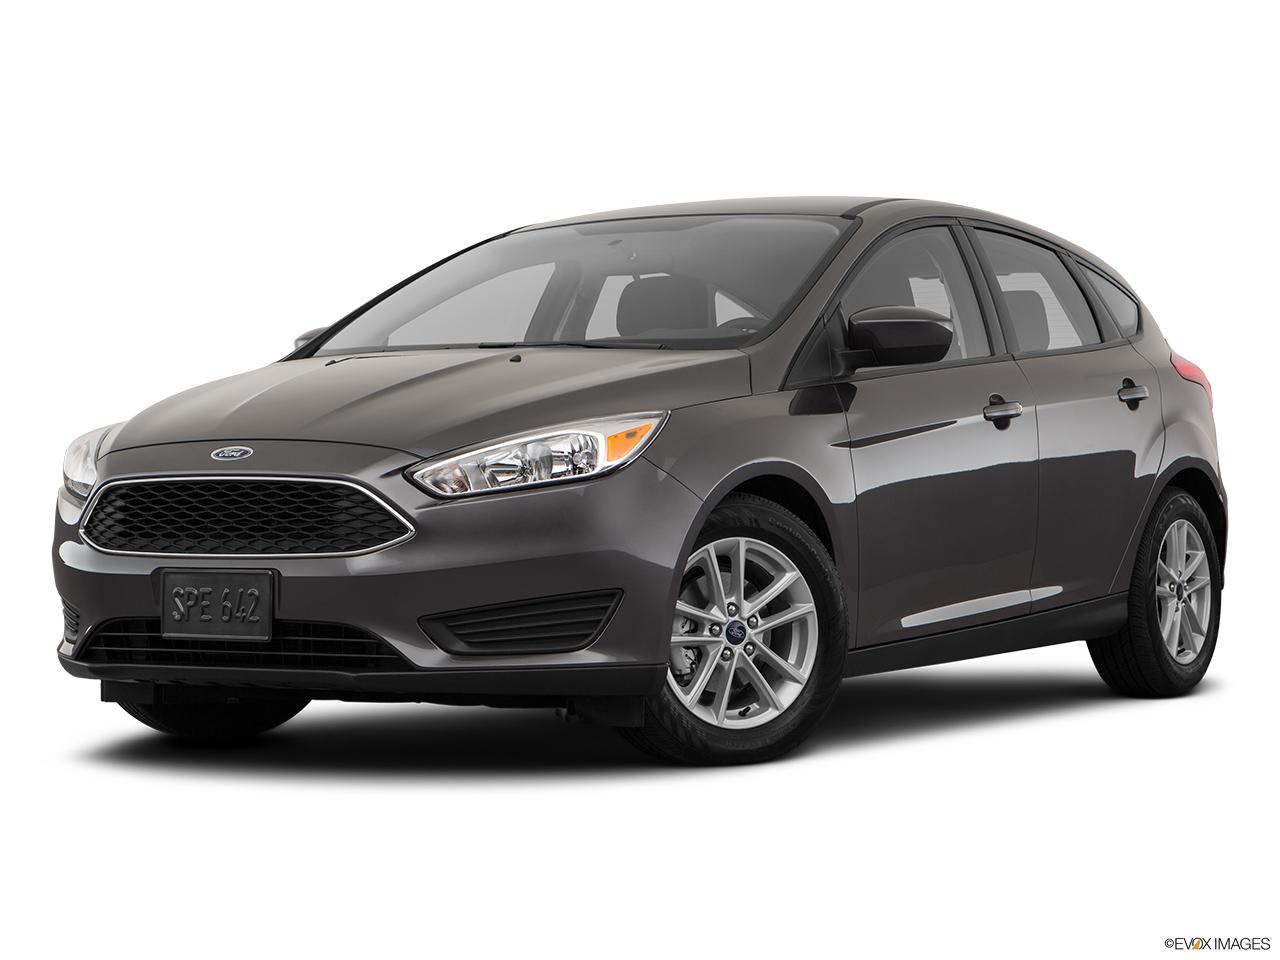 Ford focus se 2020